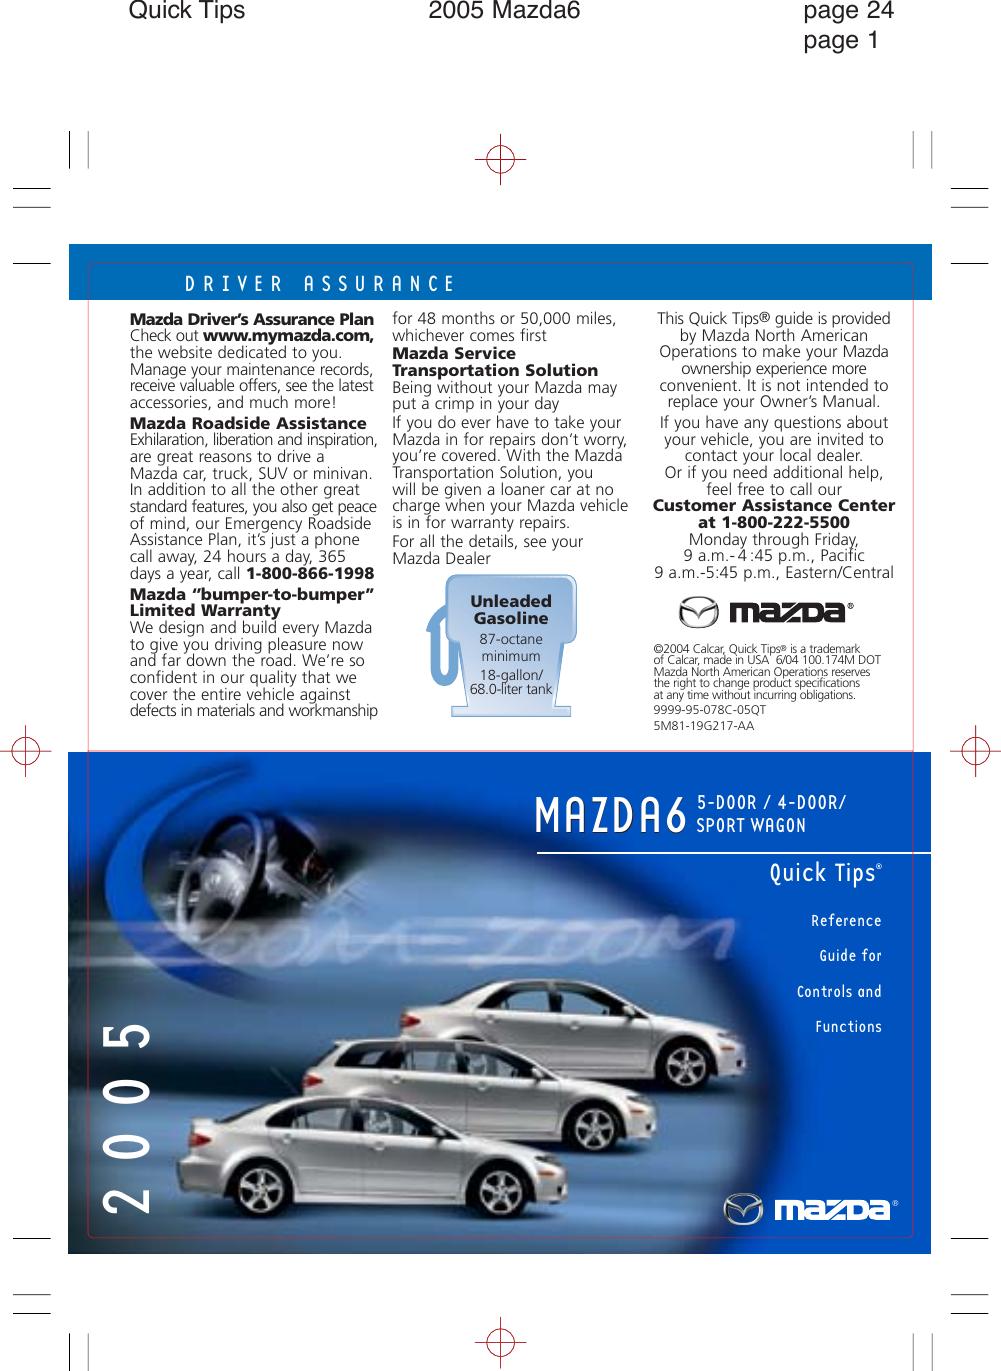 Mazda Mazda6 Sports Sedan Quick Tips 05 7 21 04